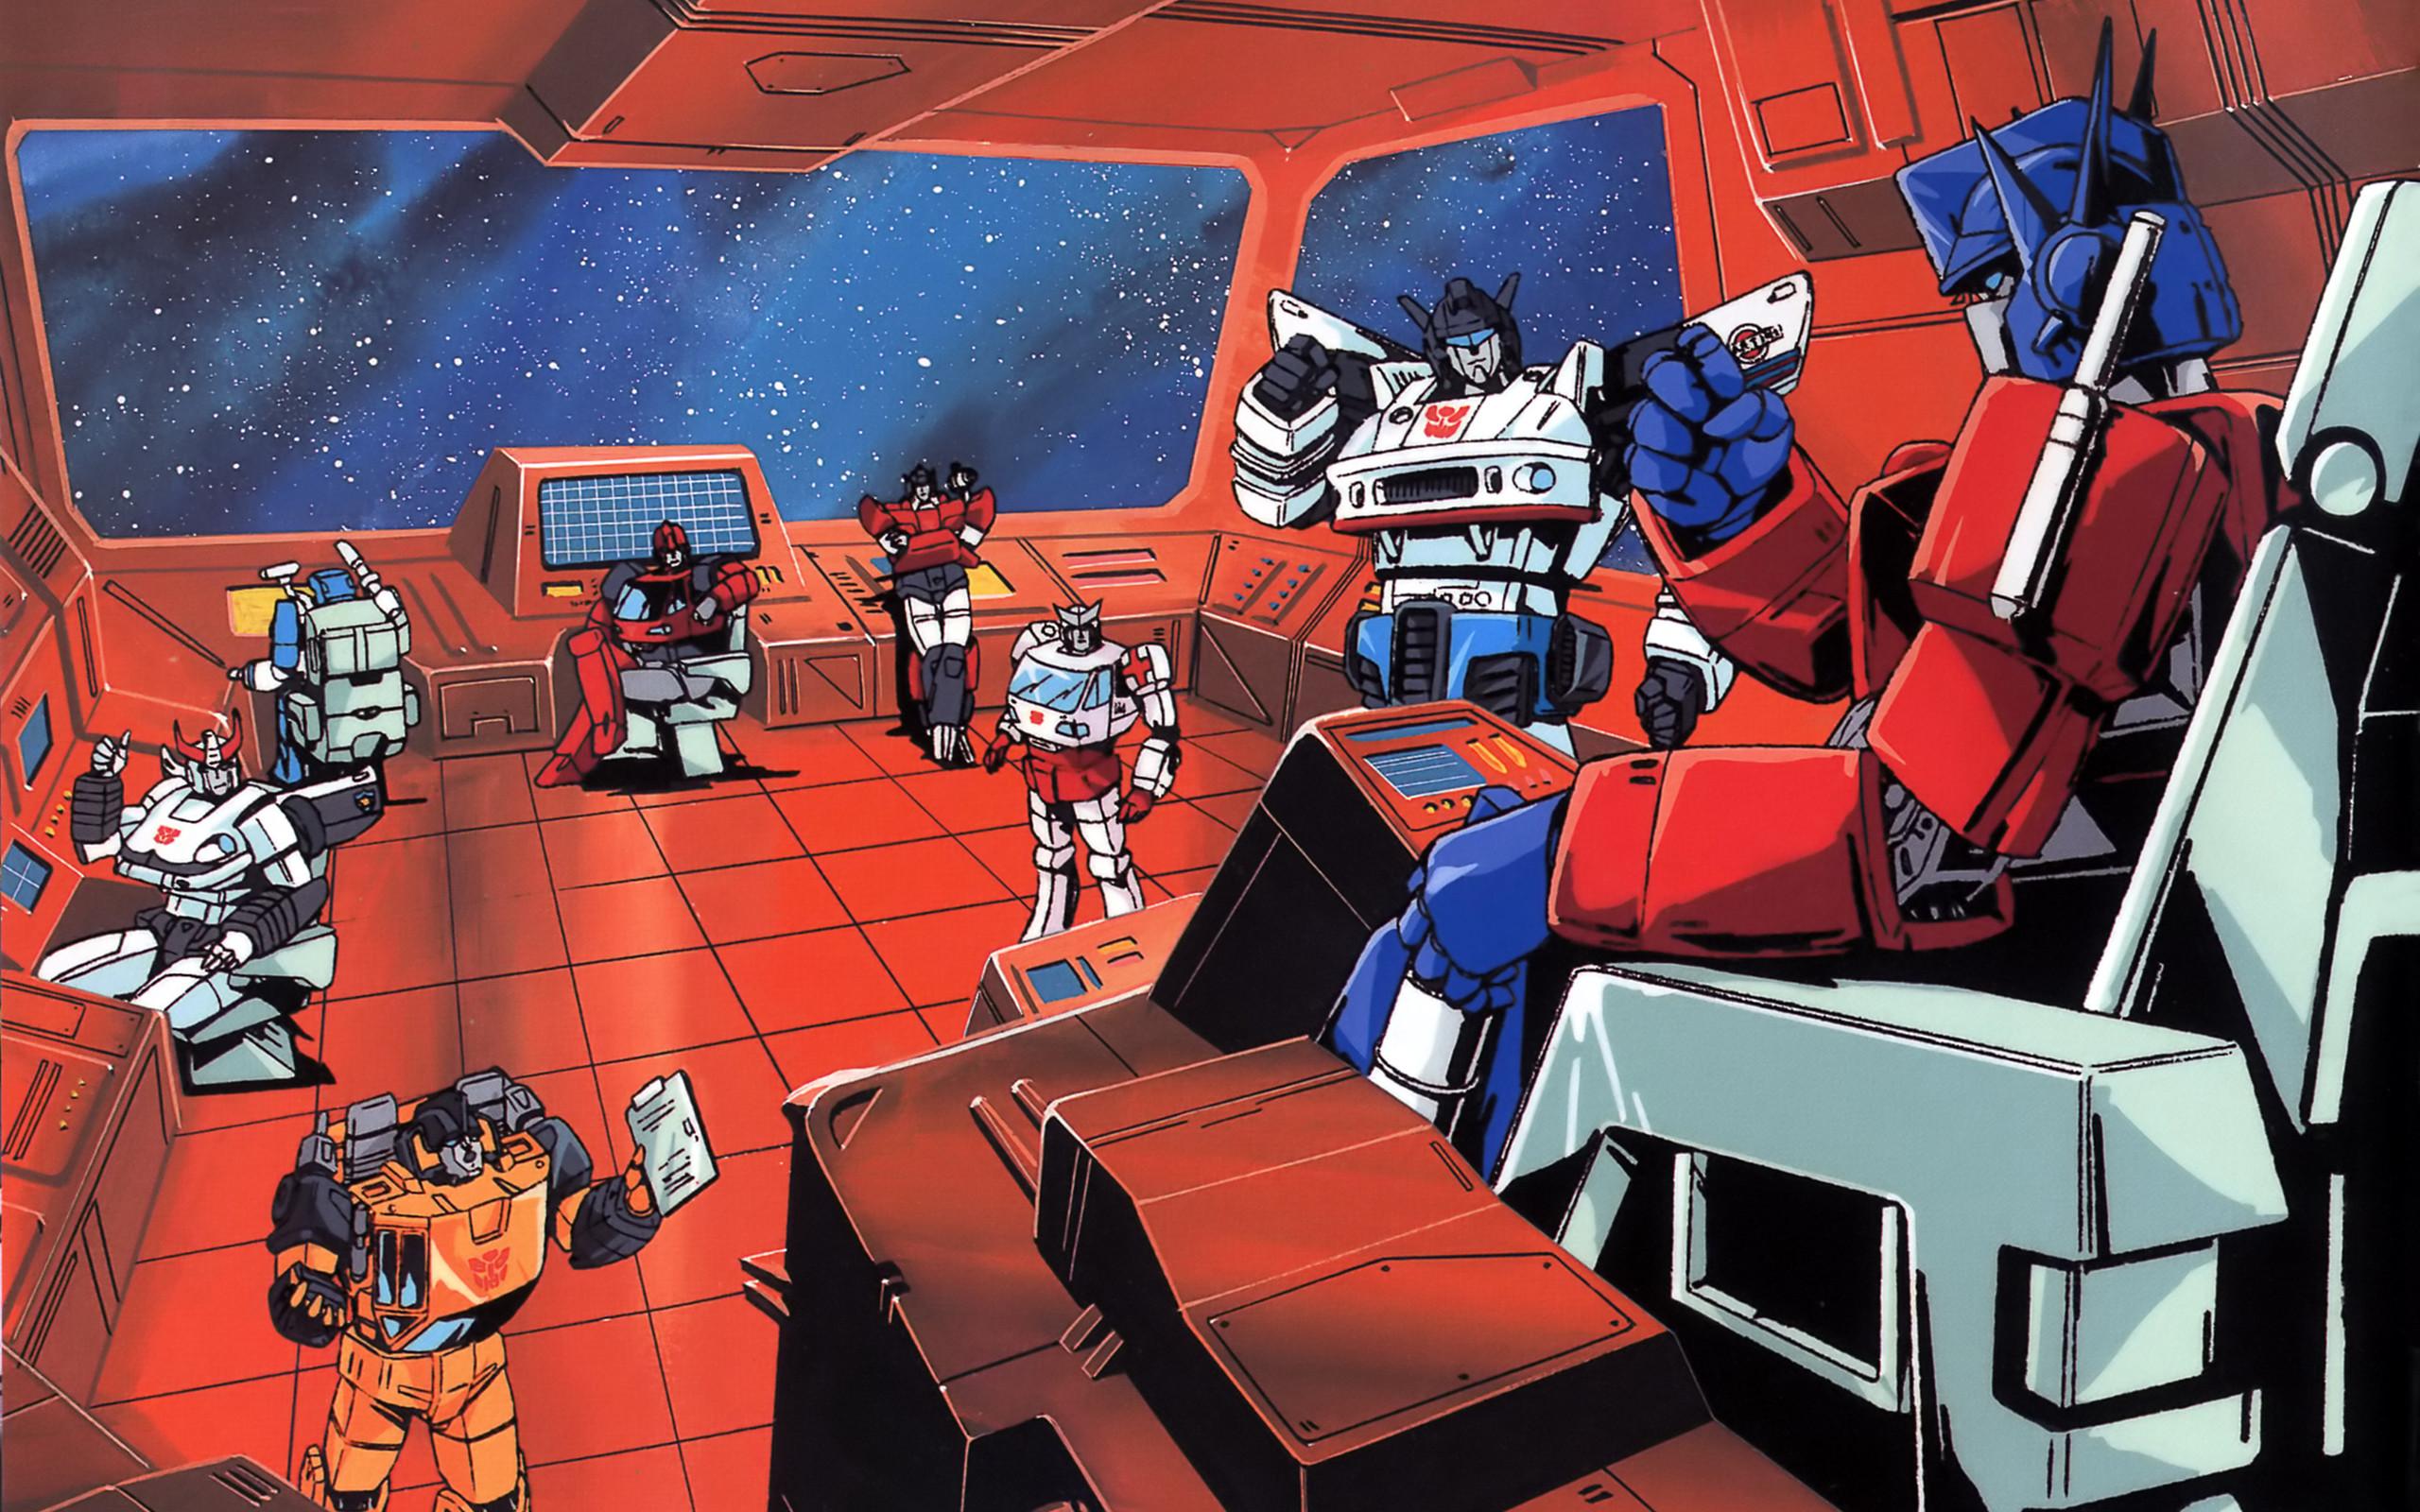 Iphone X Wallpaper Gif Landscape Transformers G1 Series Optimus Prime And Grimlock Wallpaper 183 ①